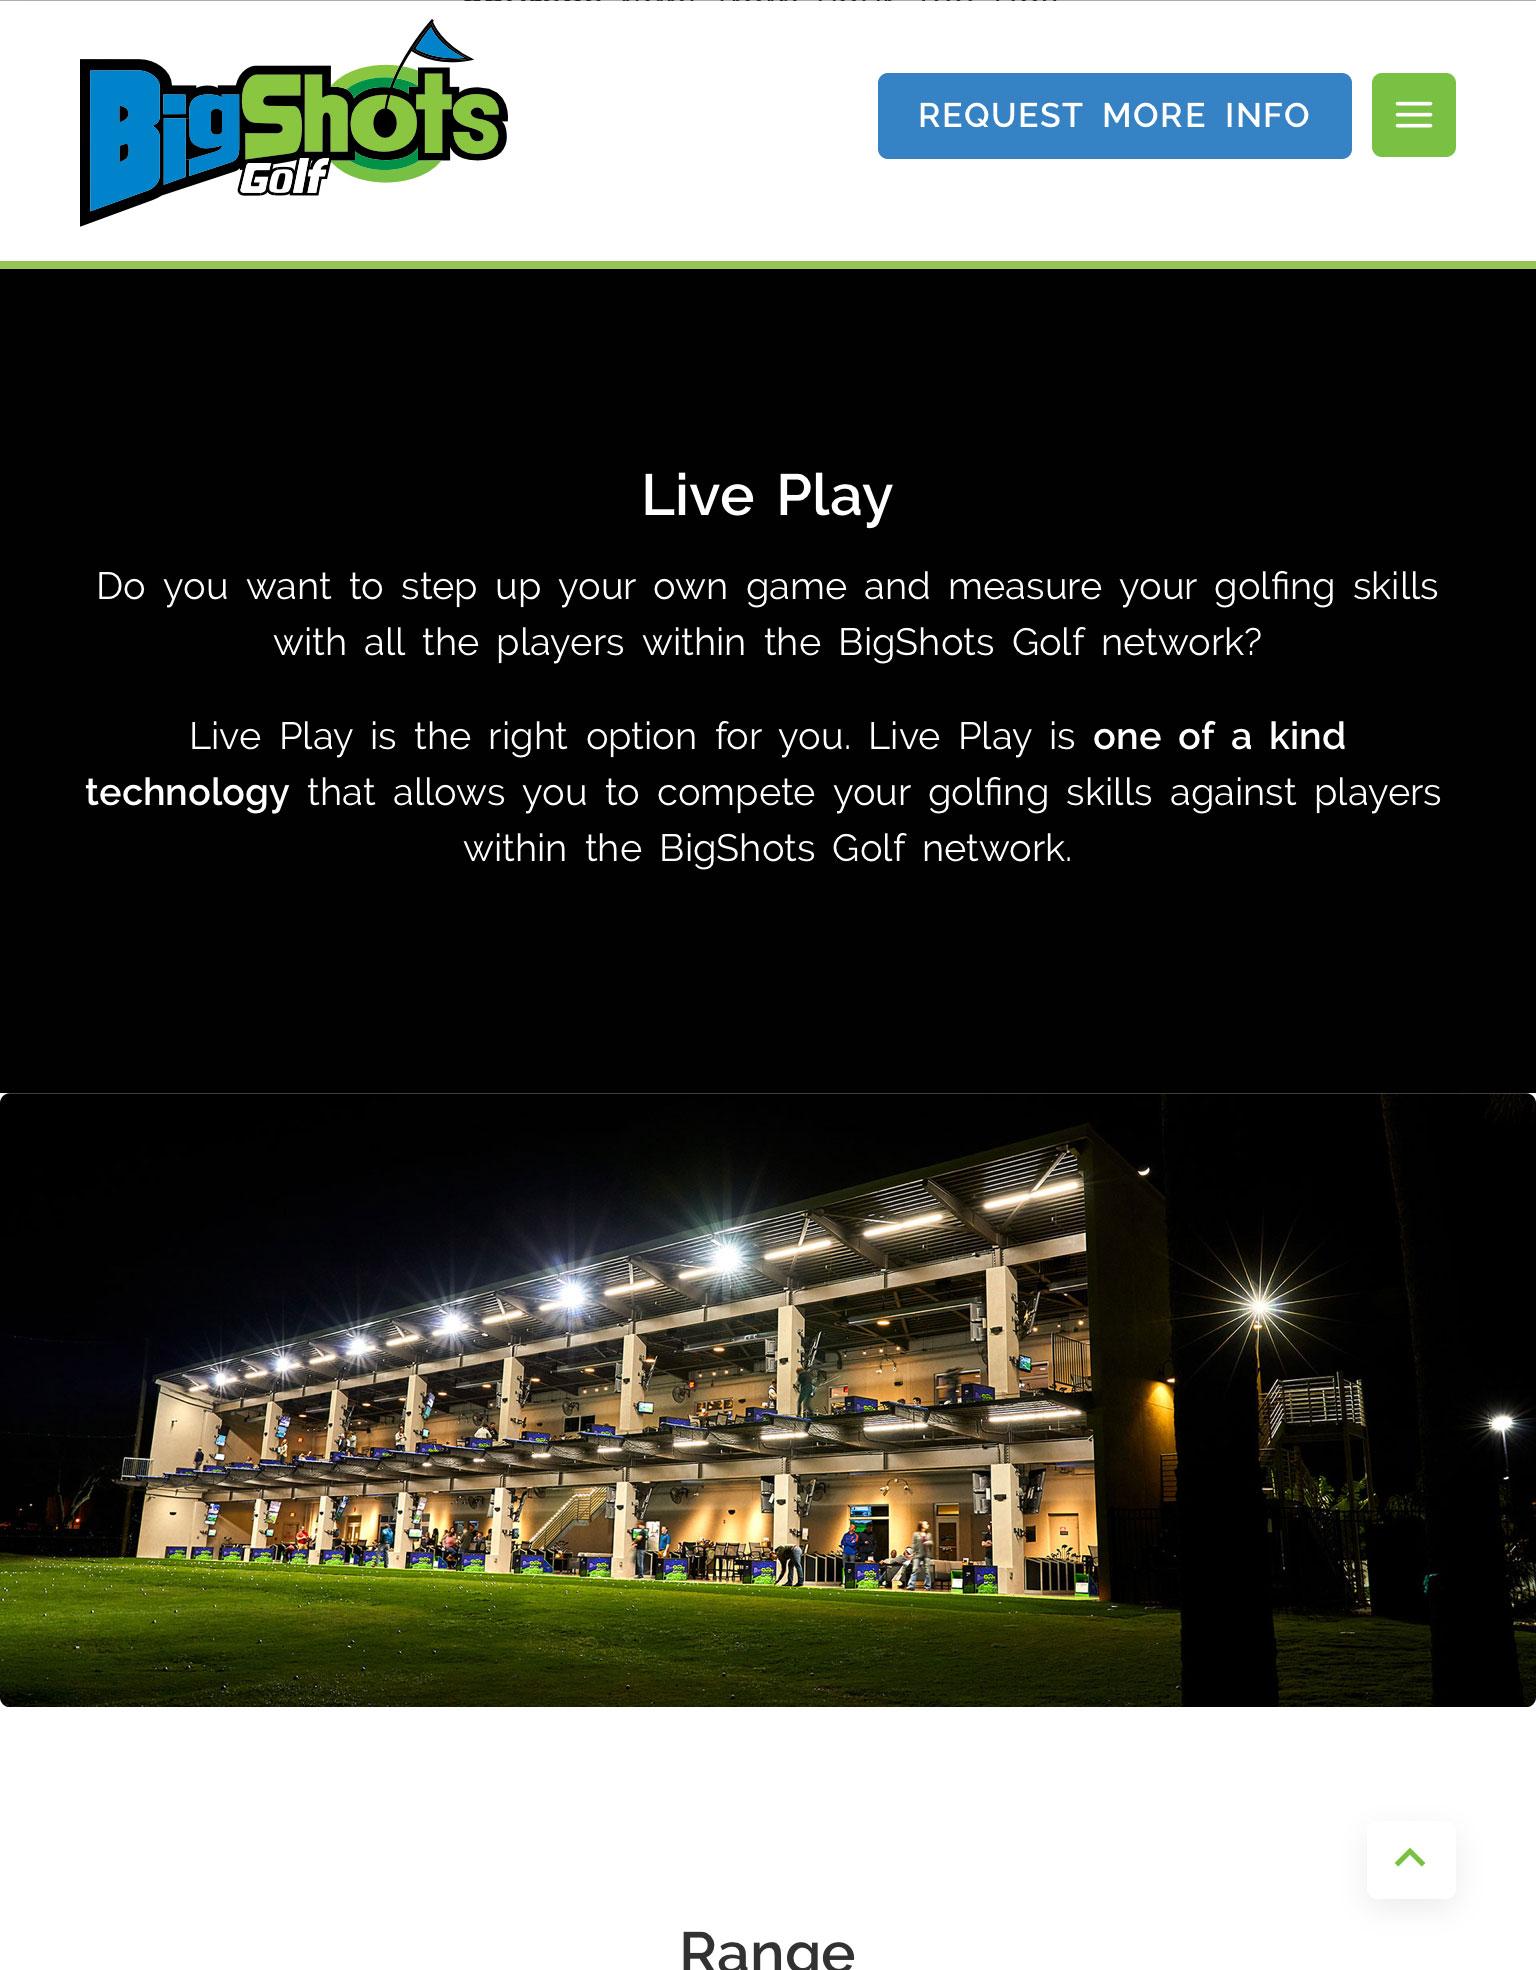 bigshots-golf-peoria-tablet-web-design-2